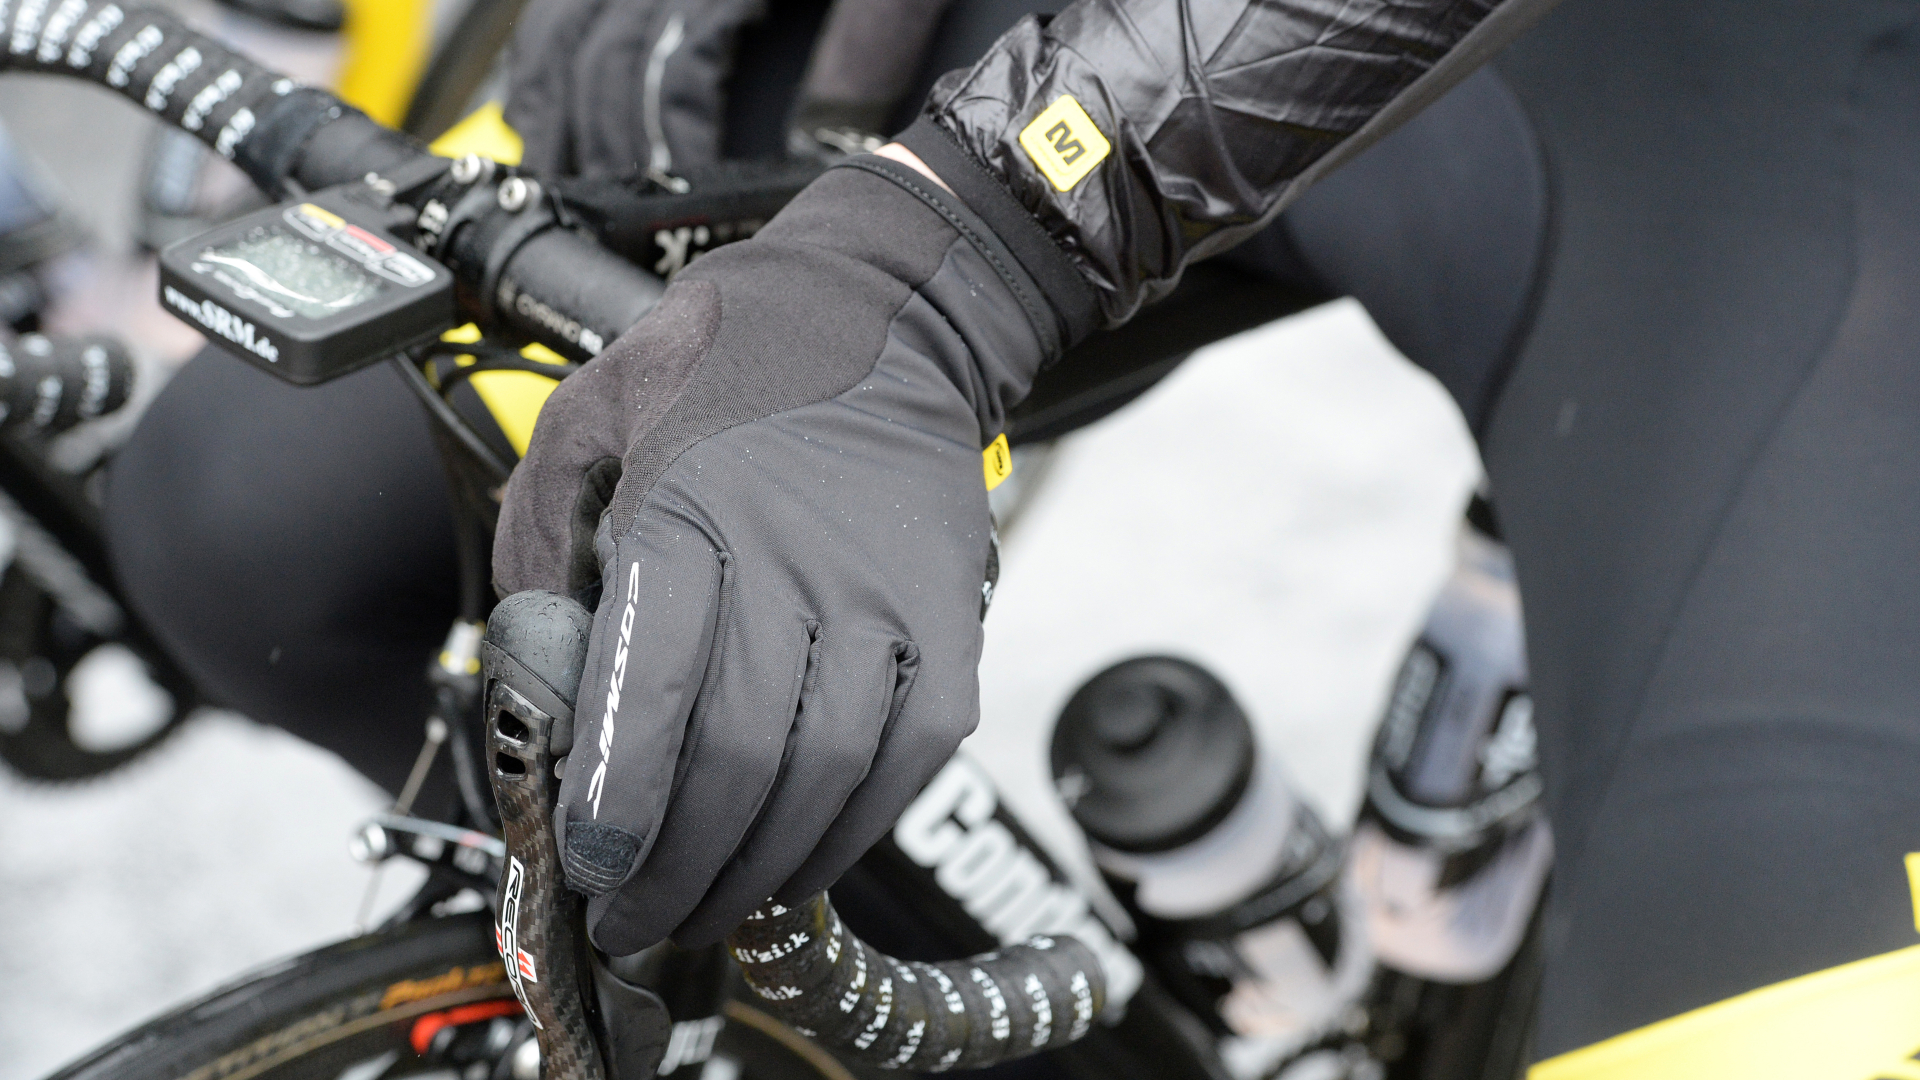 Team inEos Castelli Cyclisme Mitaines De Piste Course Gant Brand New Summer